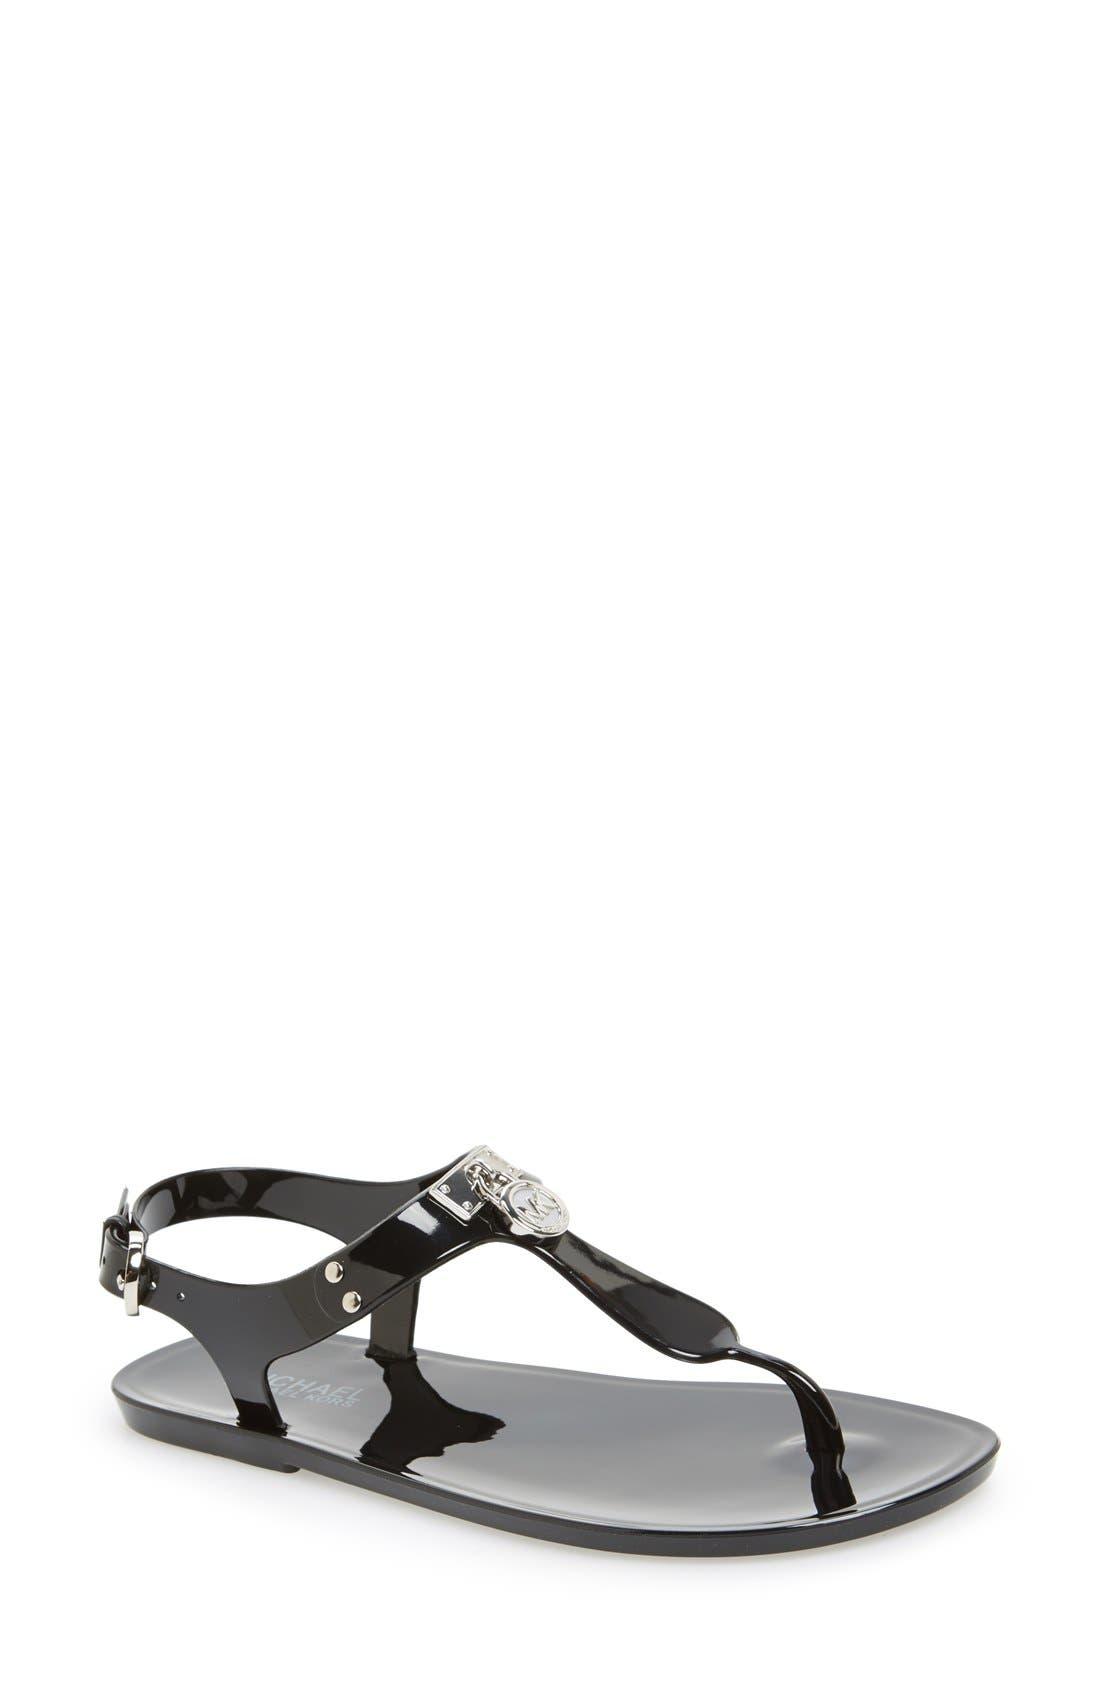 Main Image - MICHAEL Michael Kors 'Hamilton' Jelly Sandal (Women)